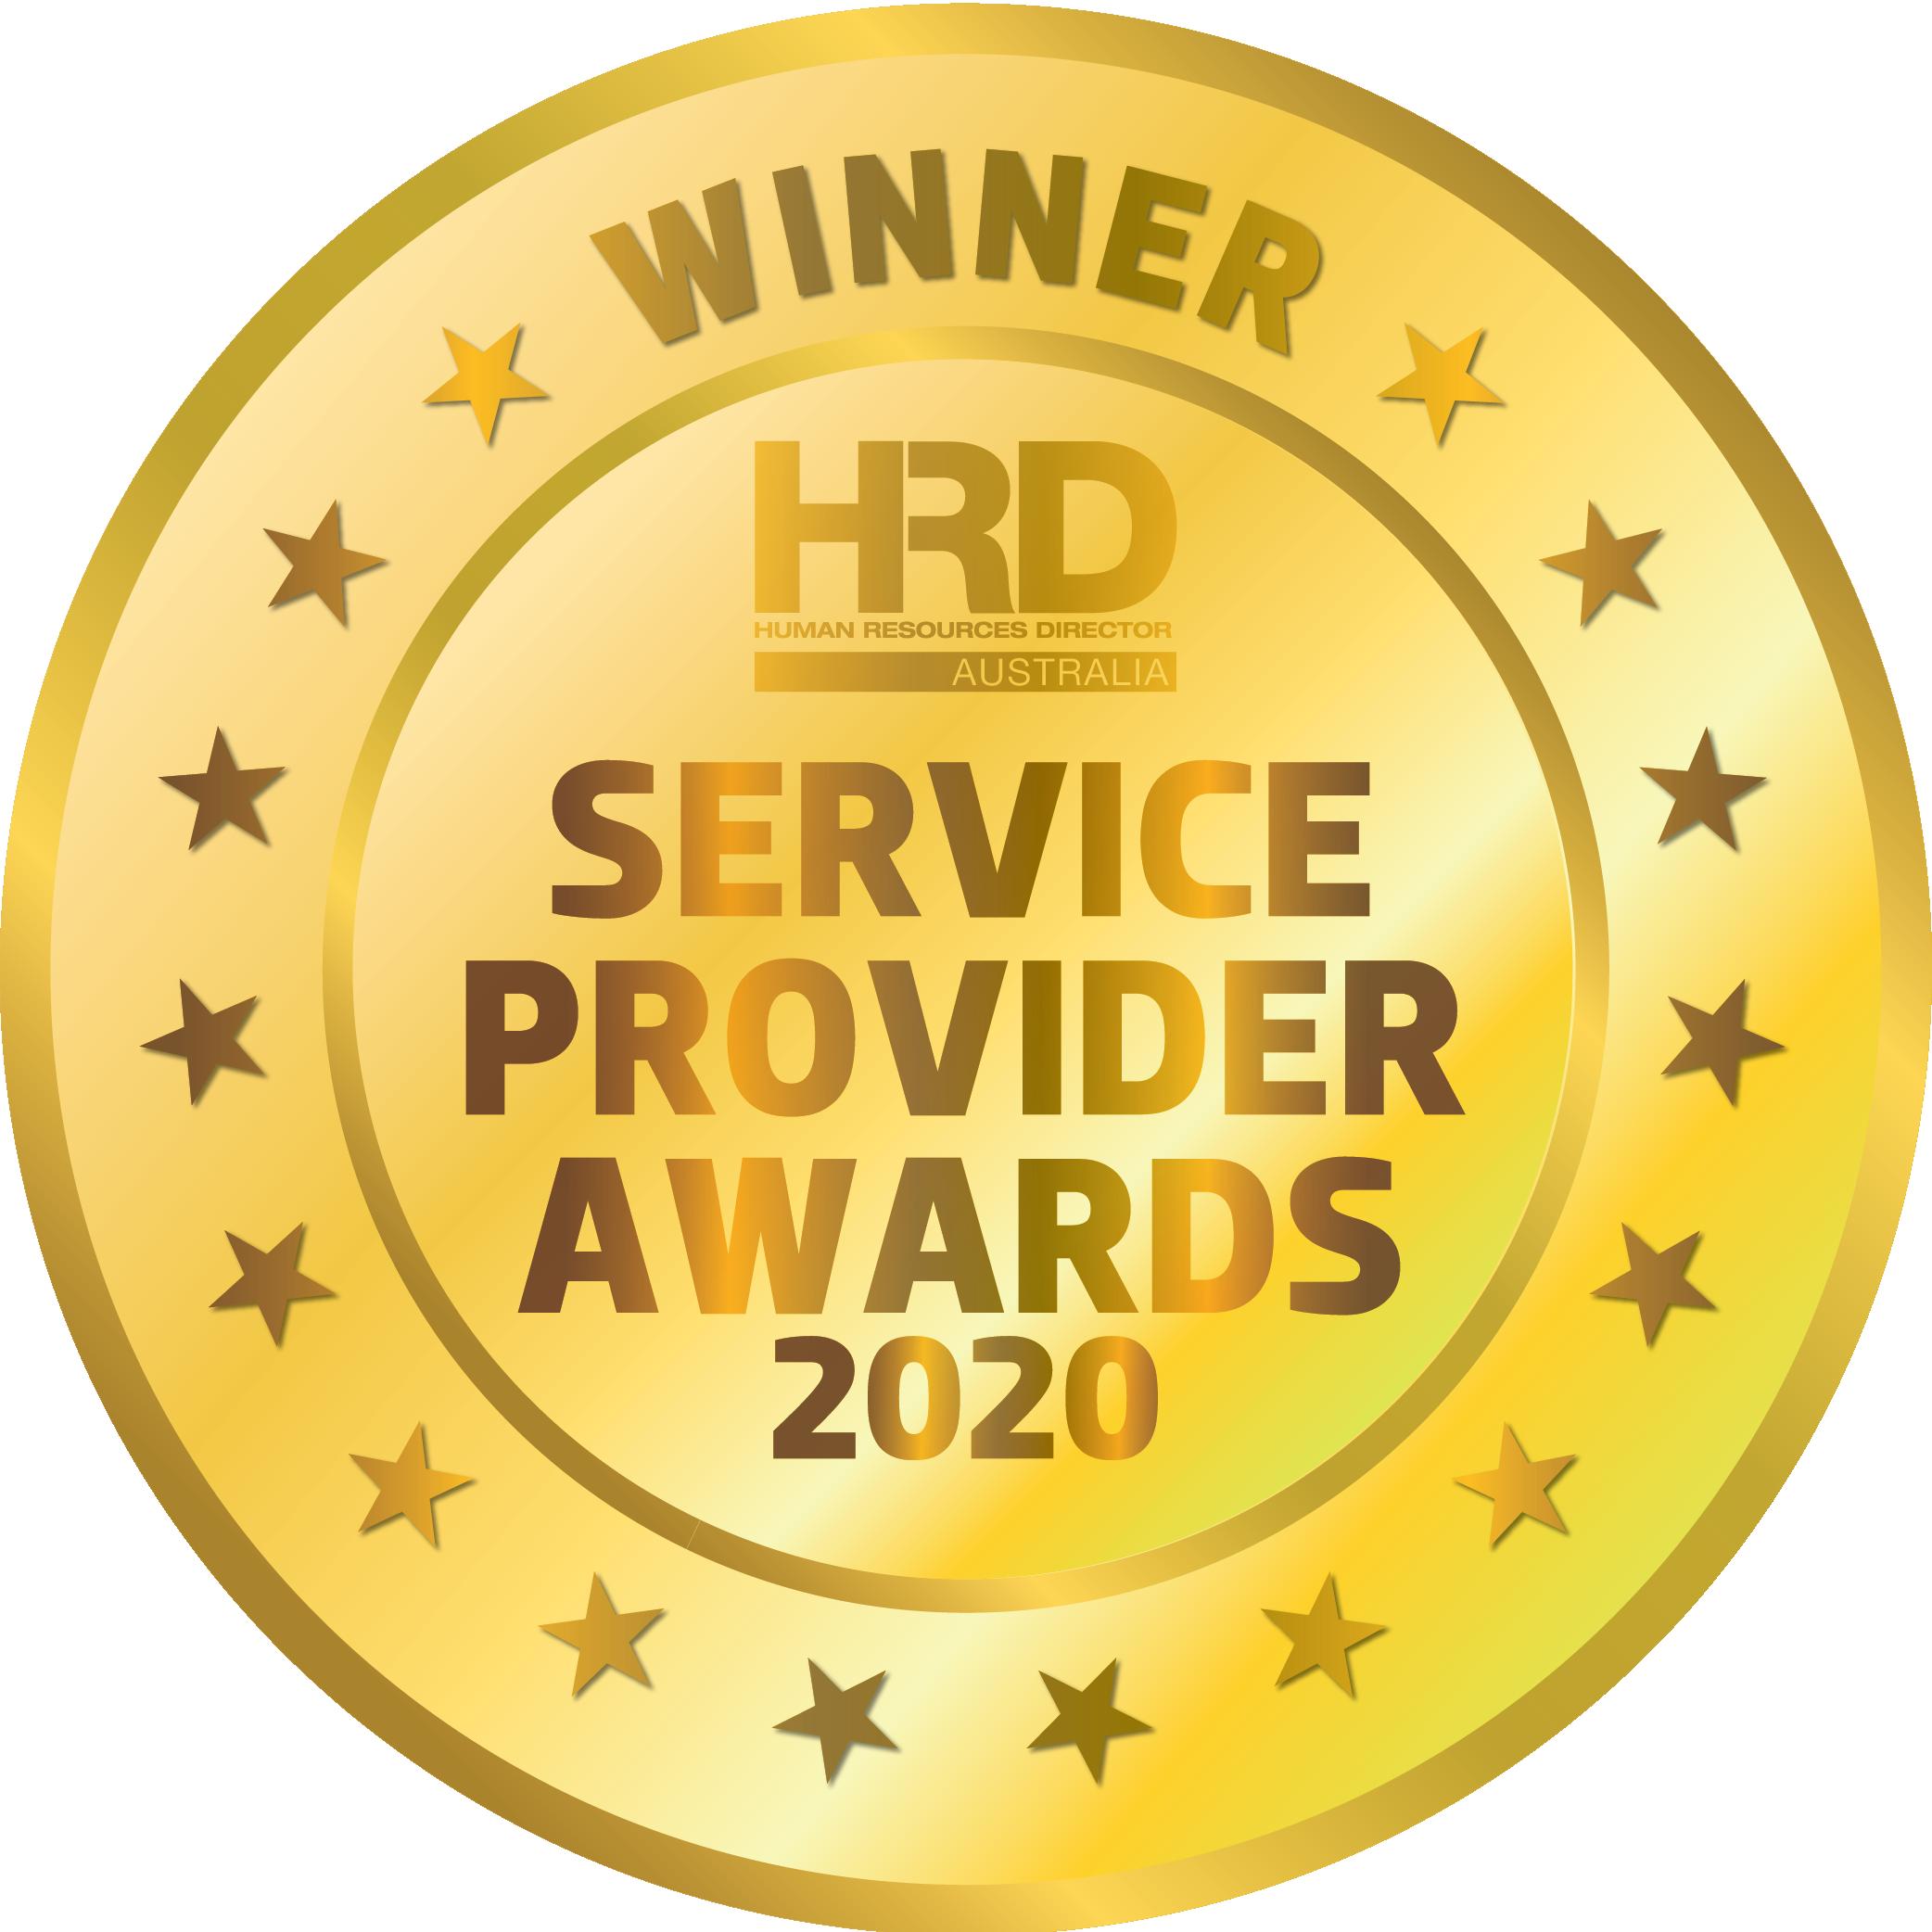 HR Service Provider Awards 2020